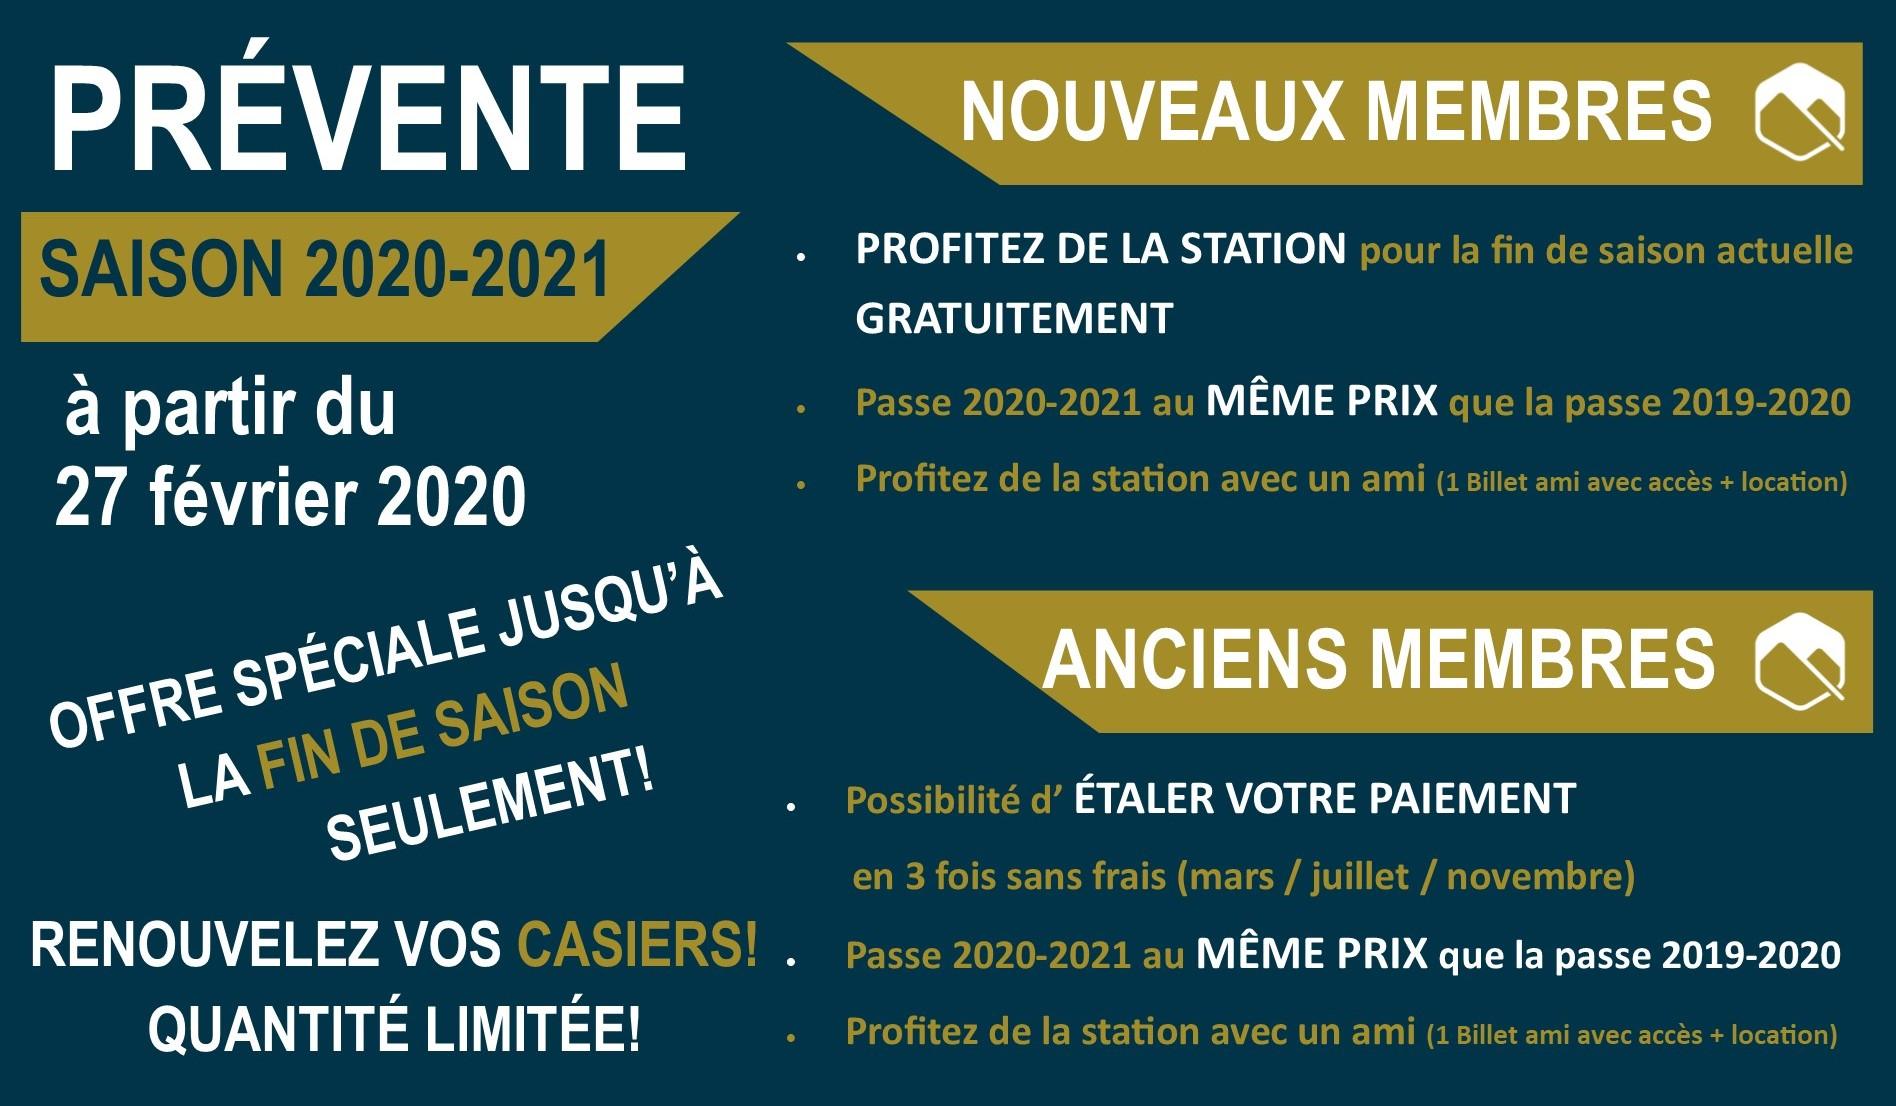 fb 2019-04-01 bandeau_printemps20